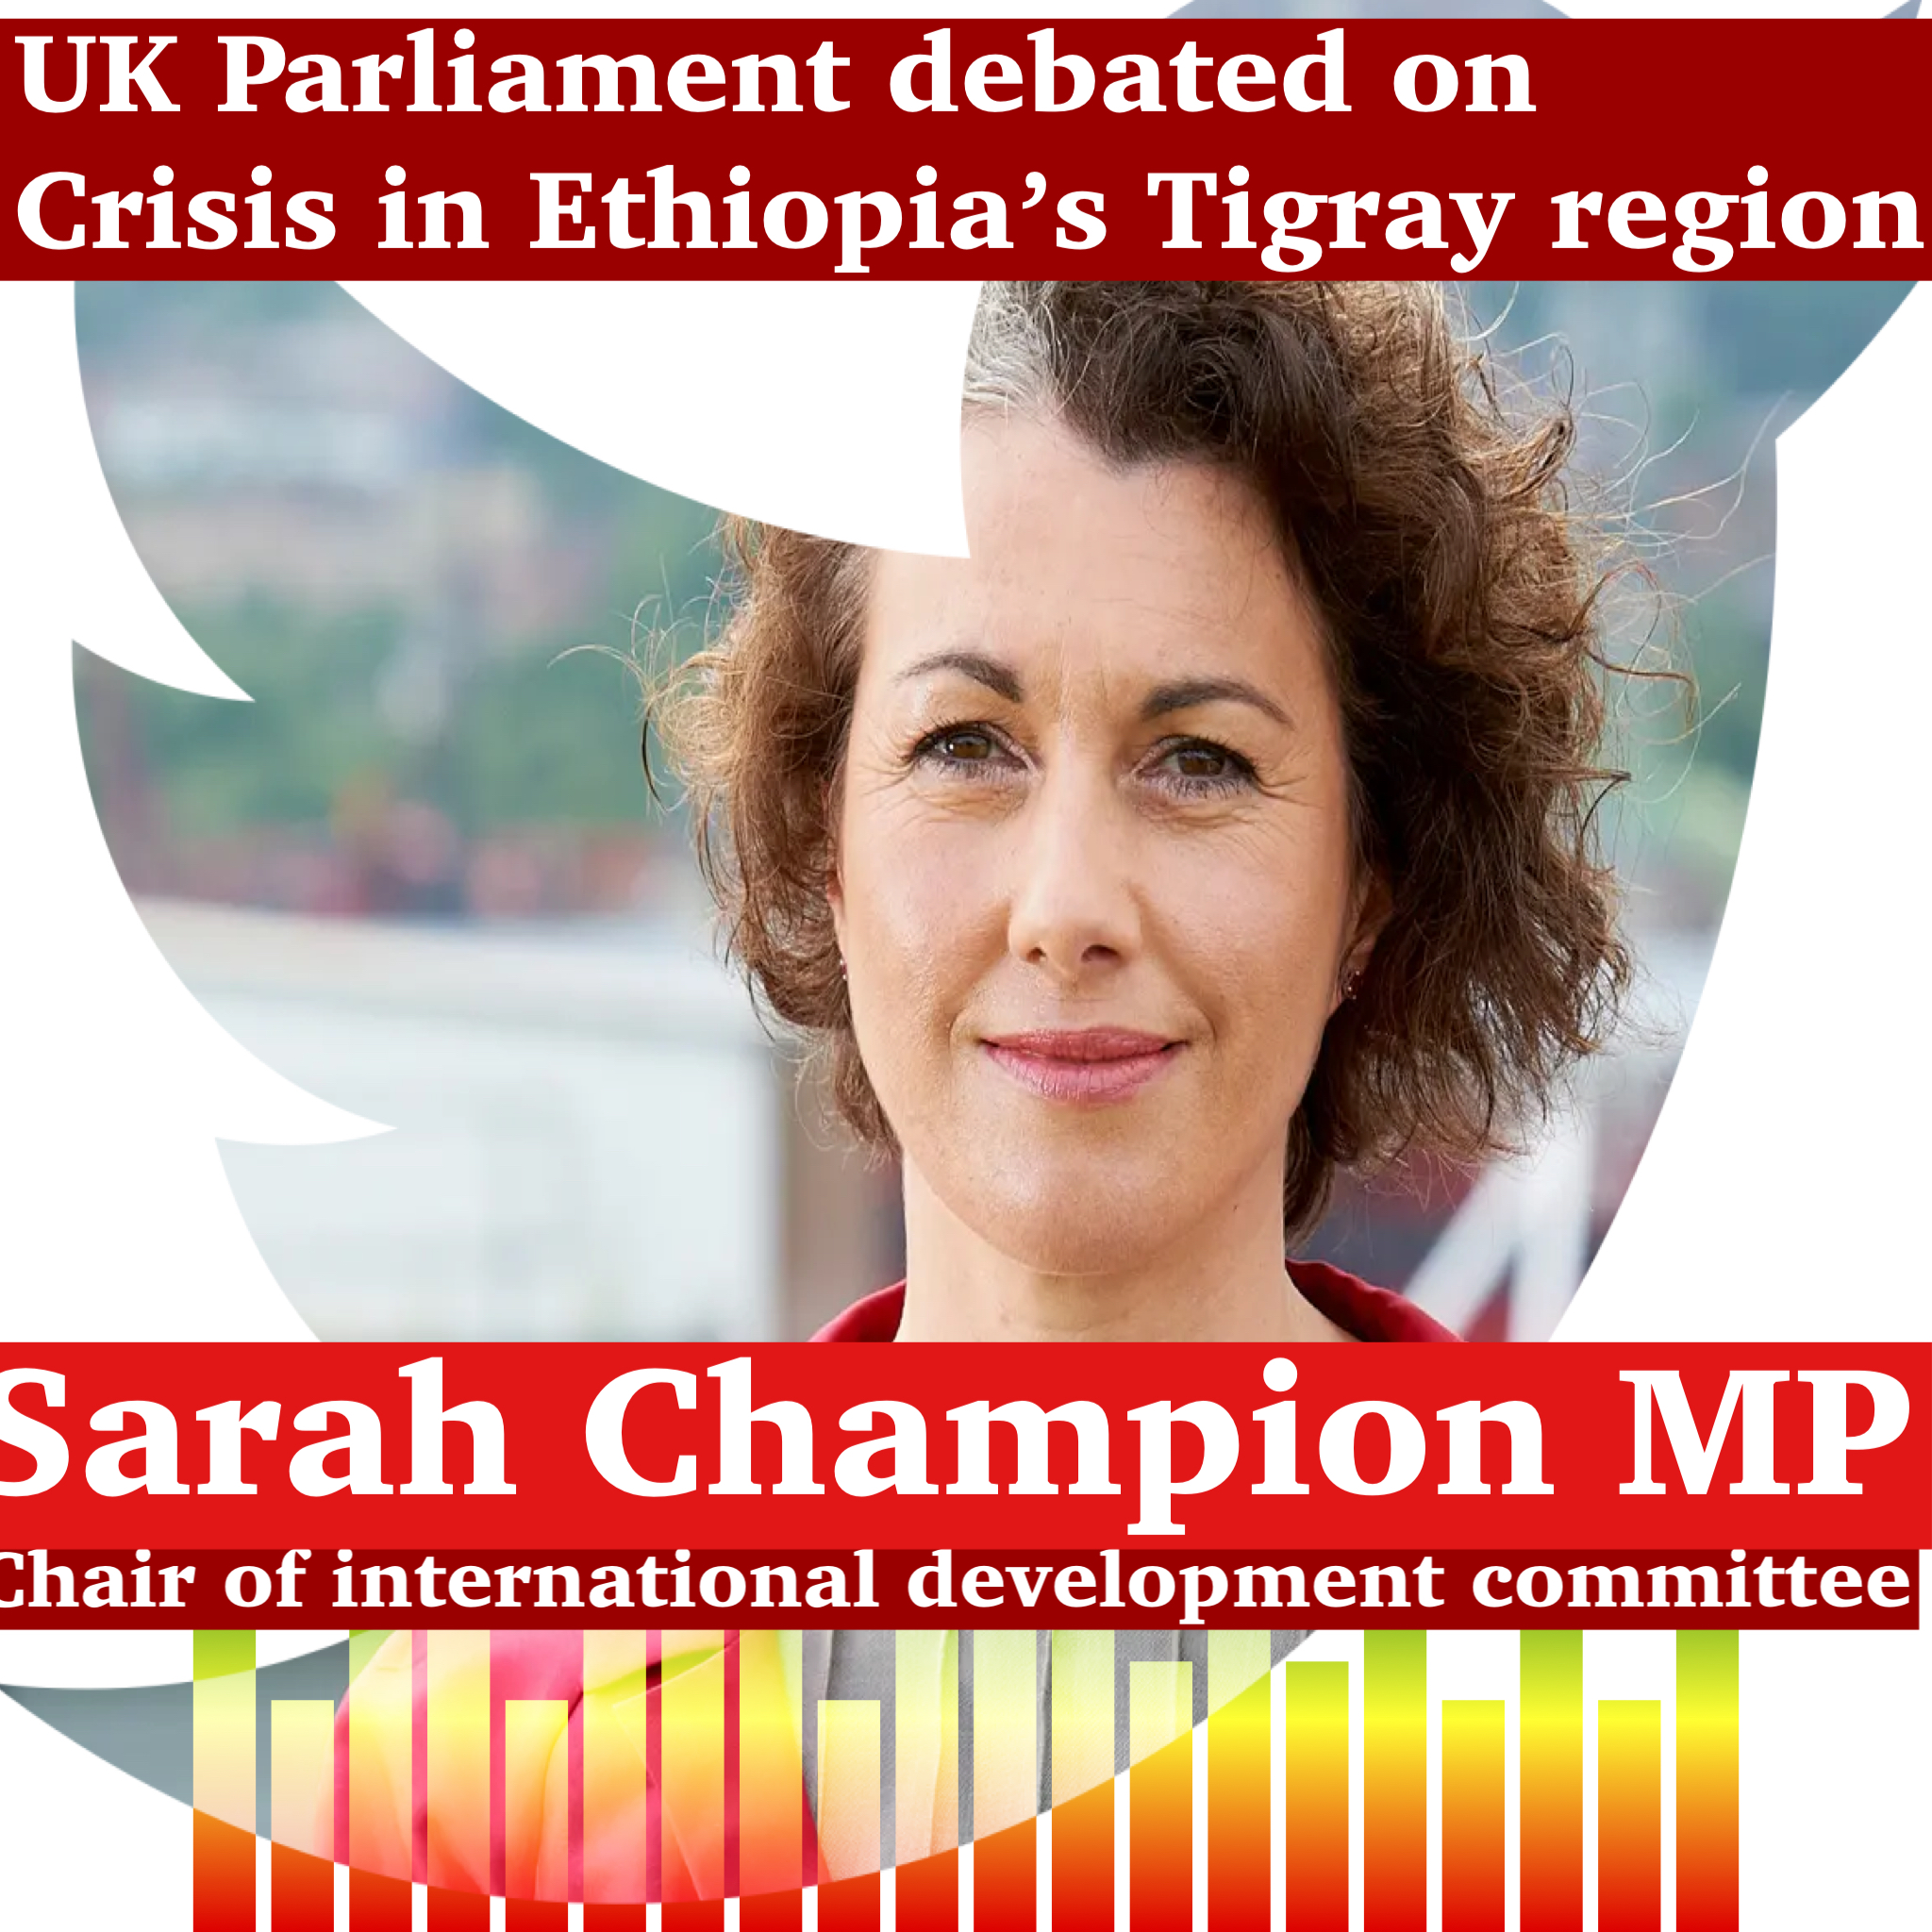 Parliamentary debate on crisis in Ethiopia's Tigray region